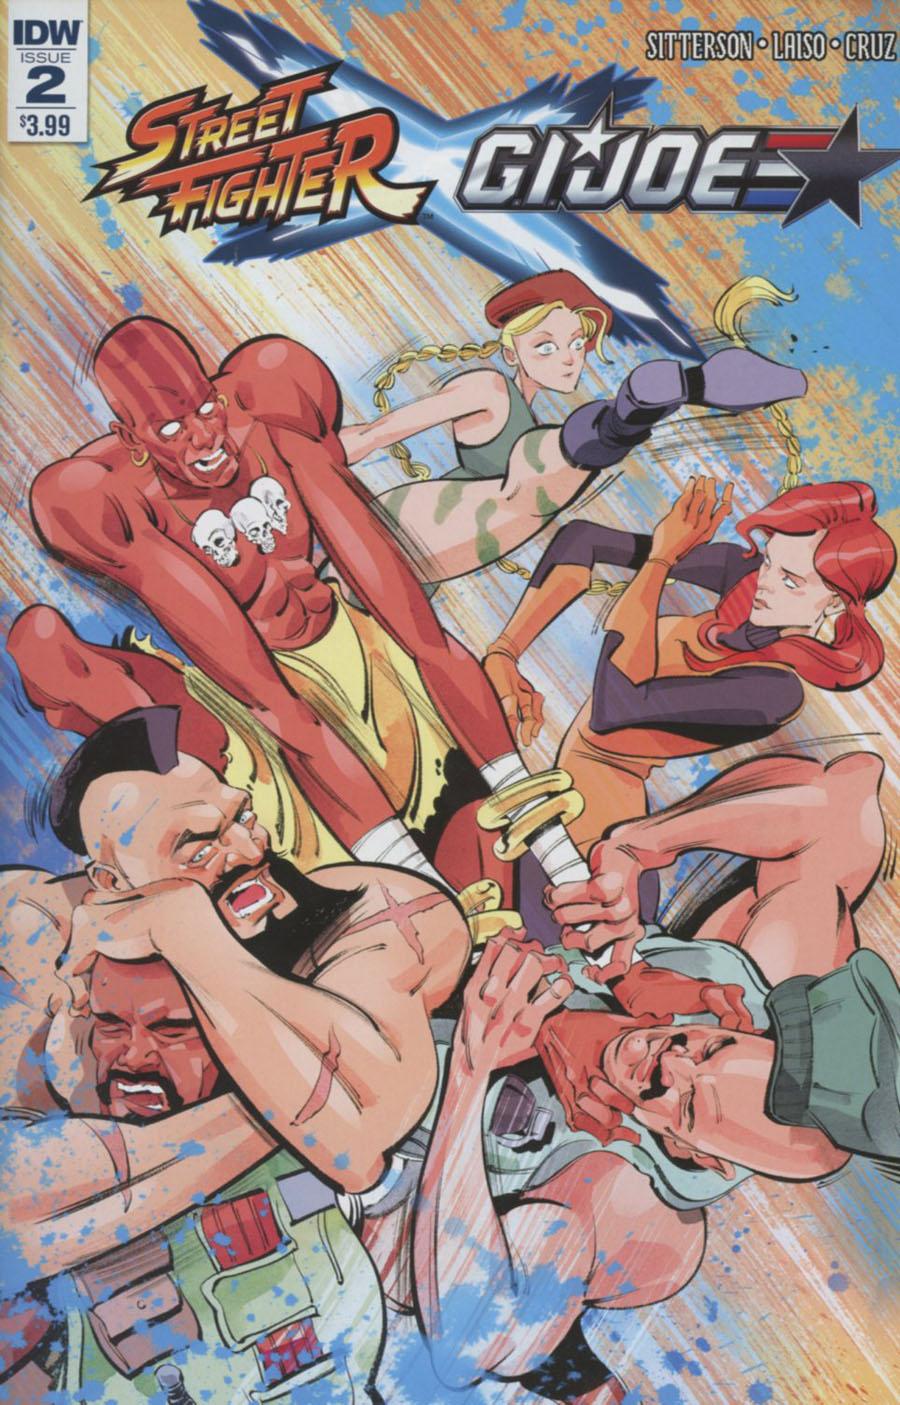 Street Fighter x GI Joe #2 Cover A Regular Kagan McLeod Cover